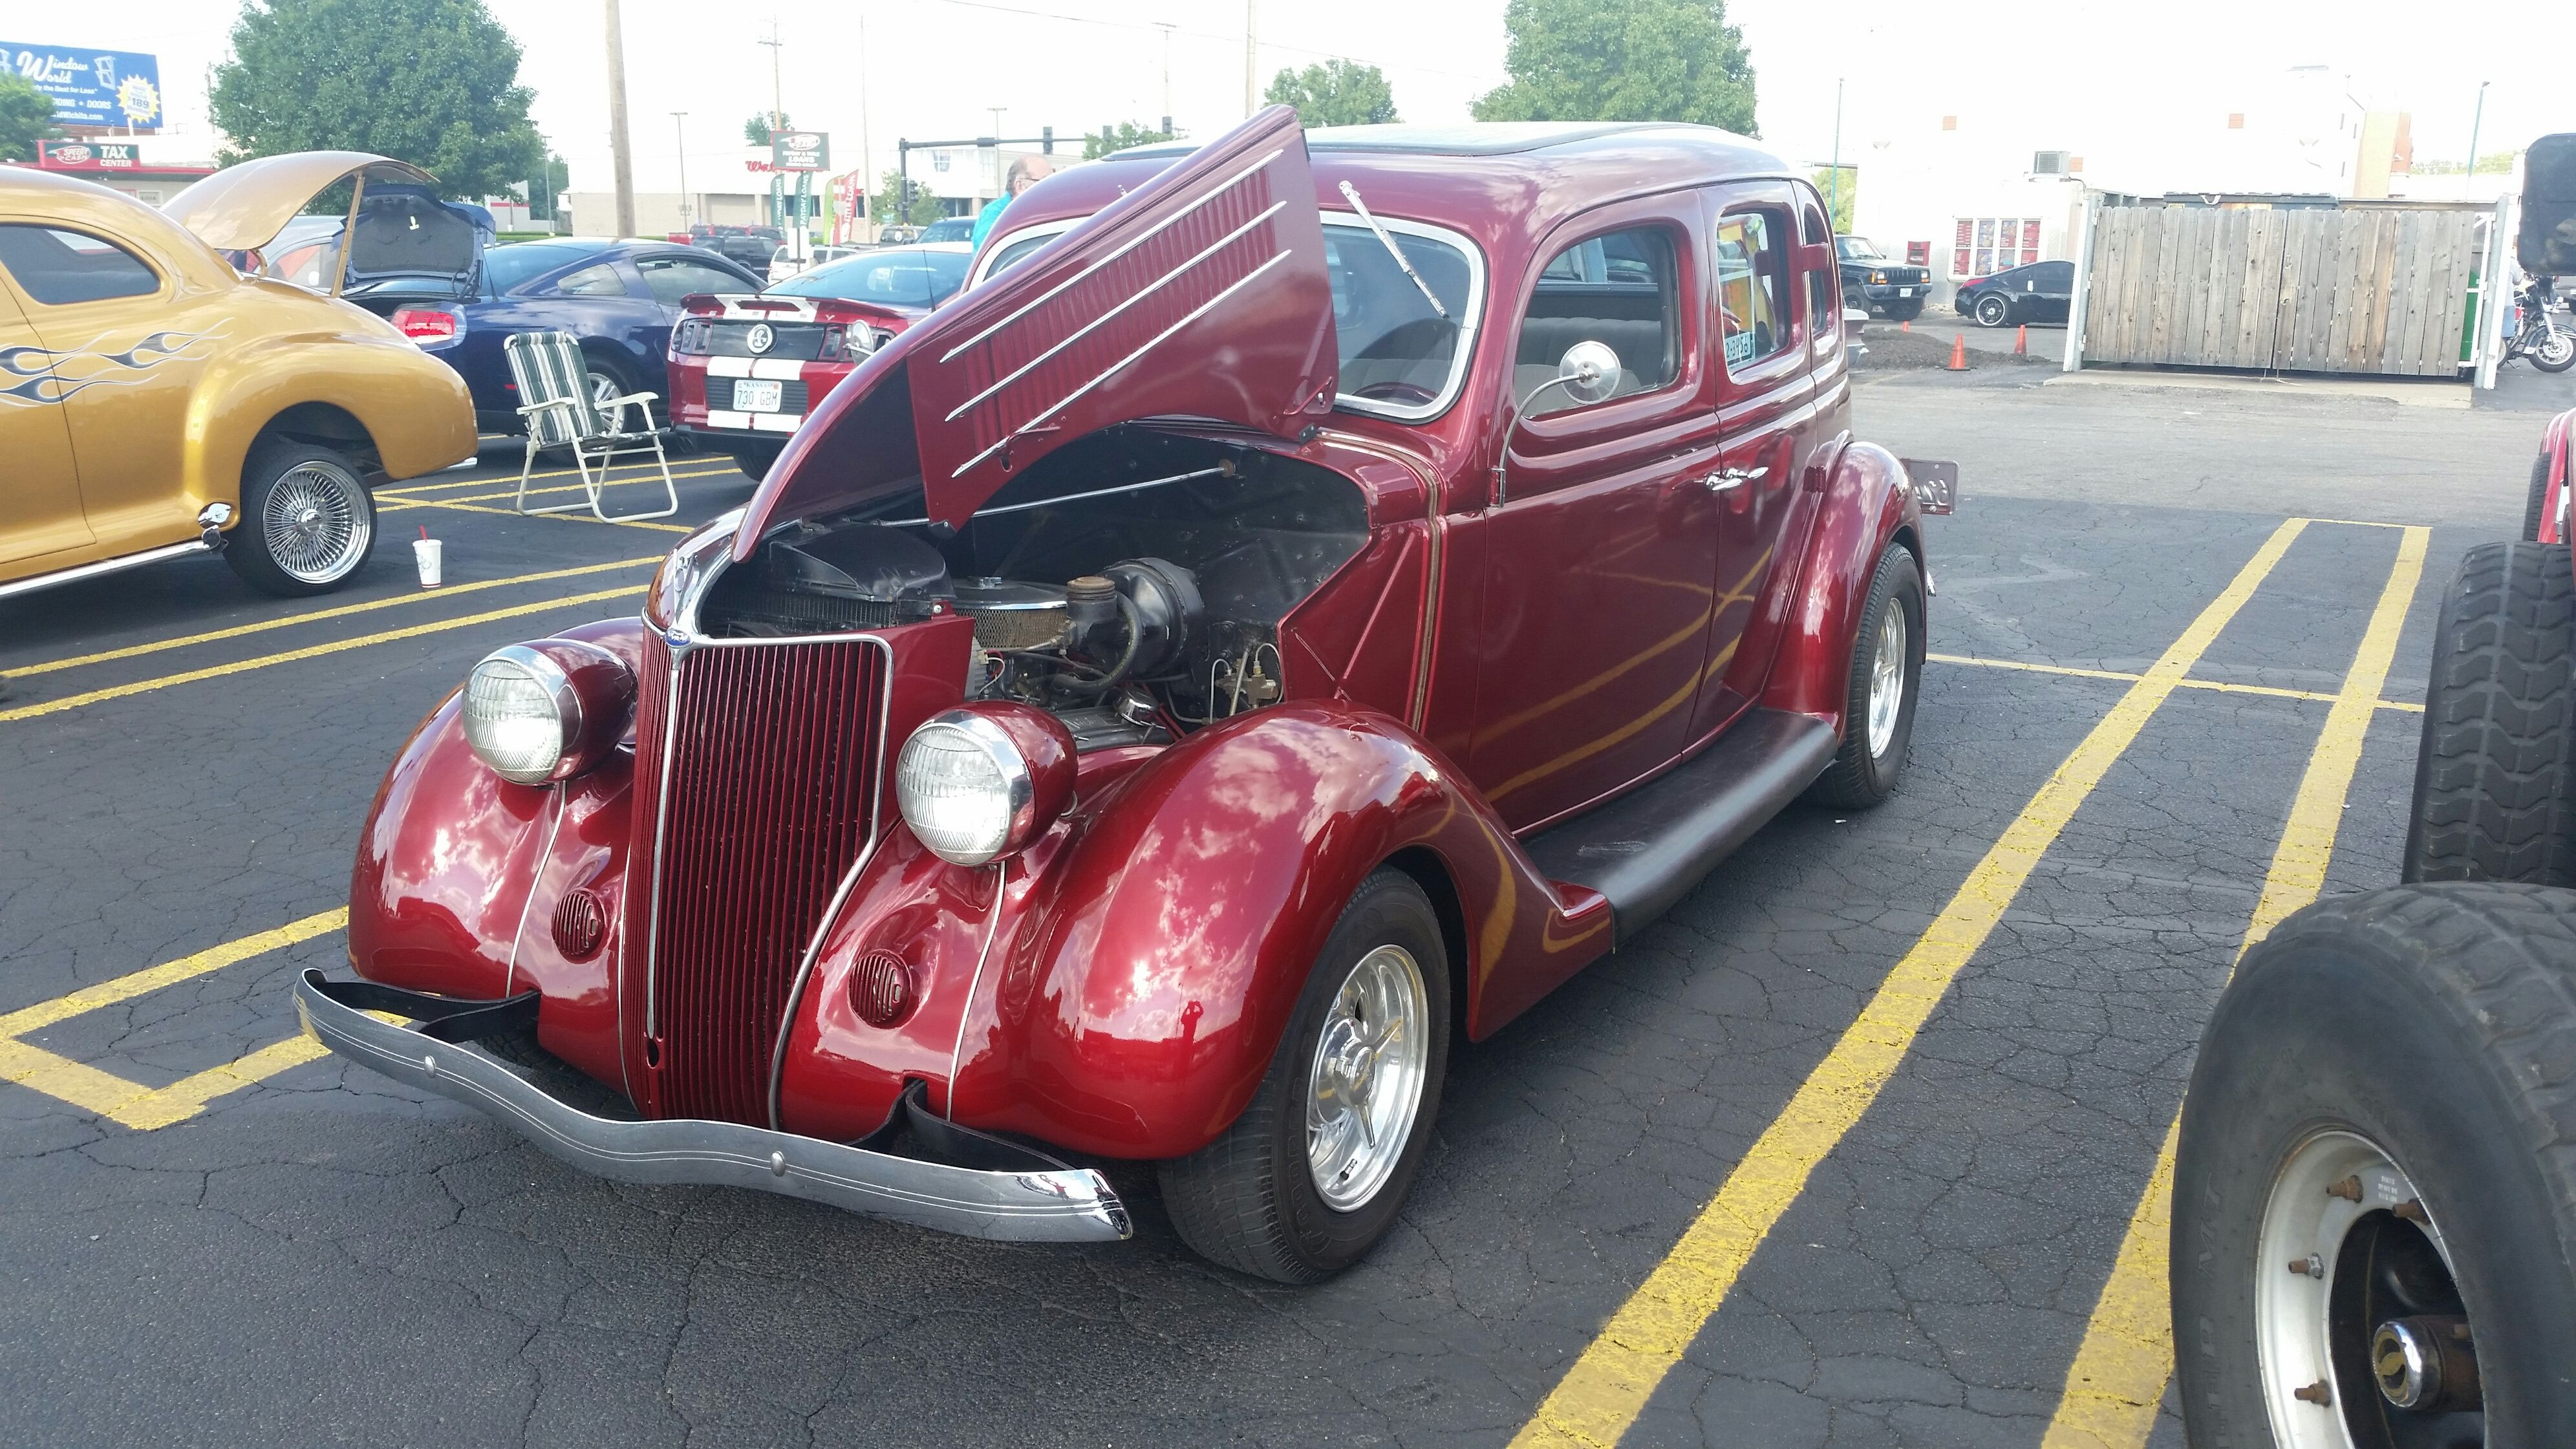 For Sale: 1936 Ford 4 Door Sedan Street Rod $26500 at: www.motorn ...